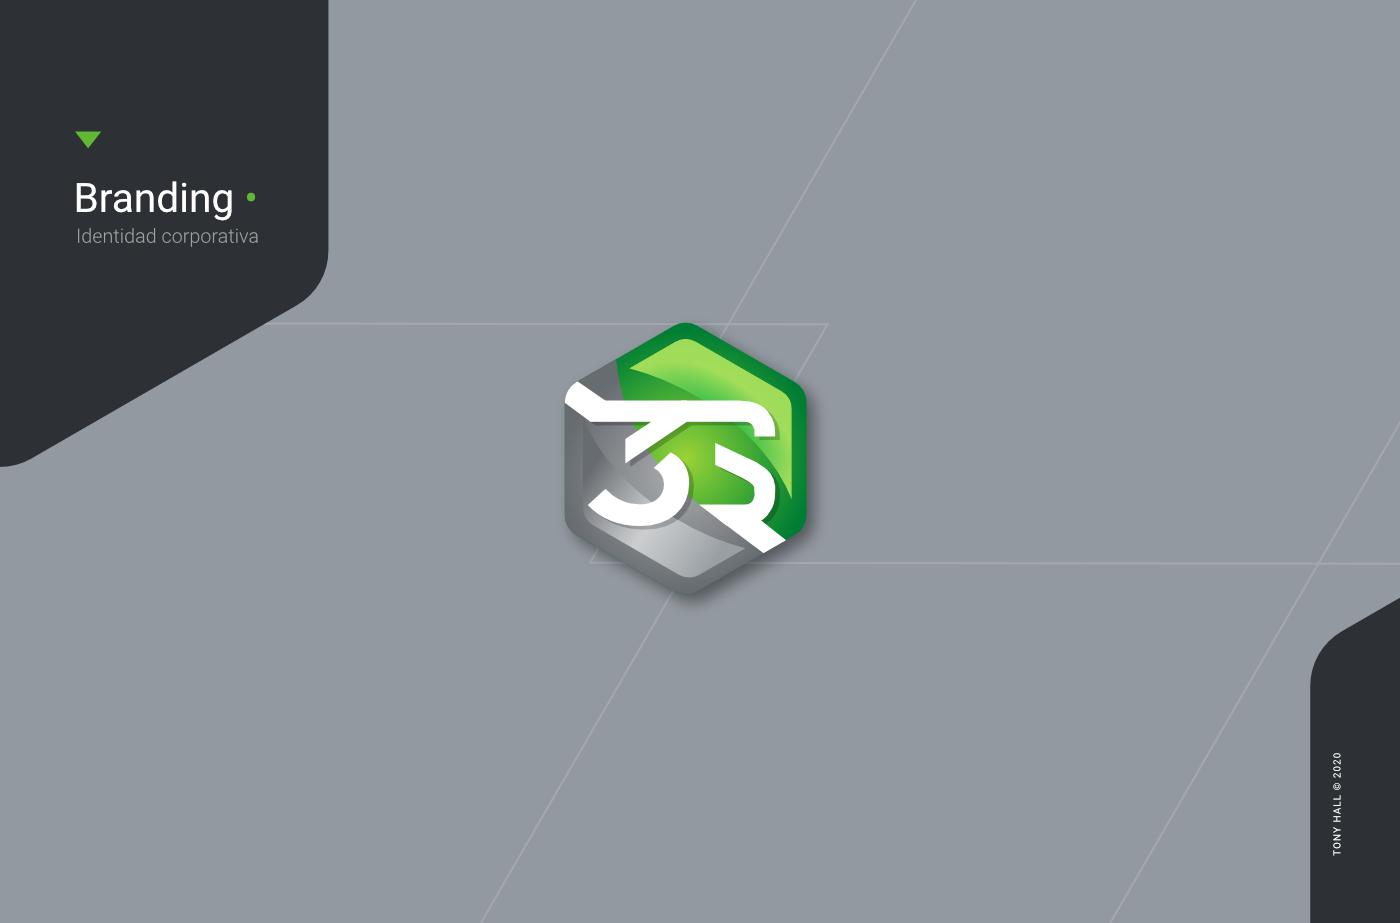 tonyhall-branding-3s-p1